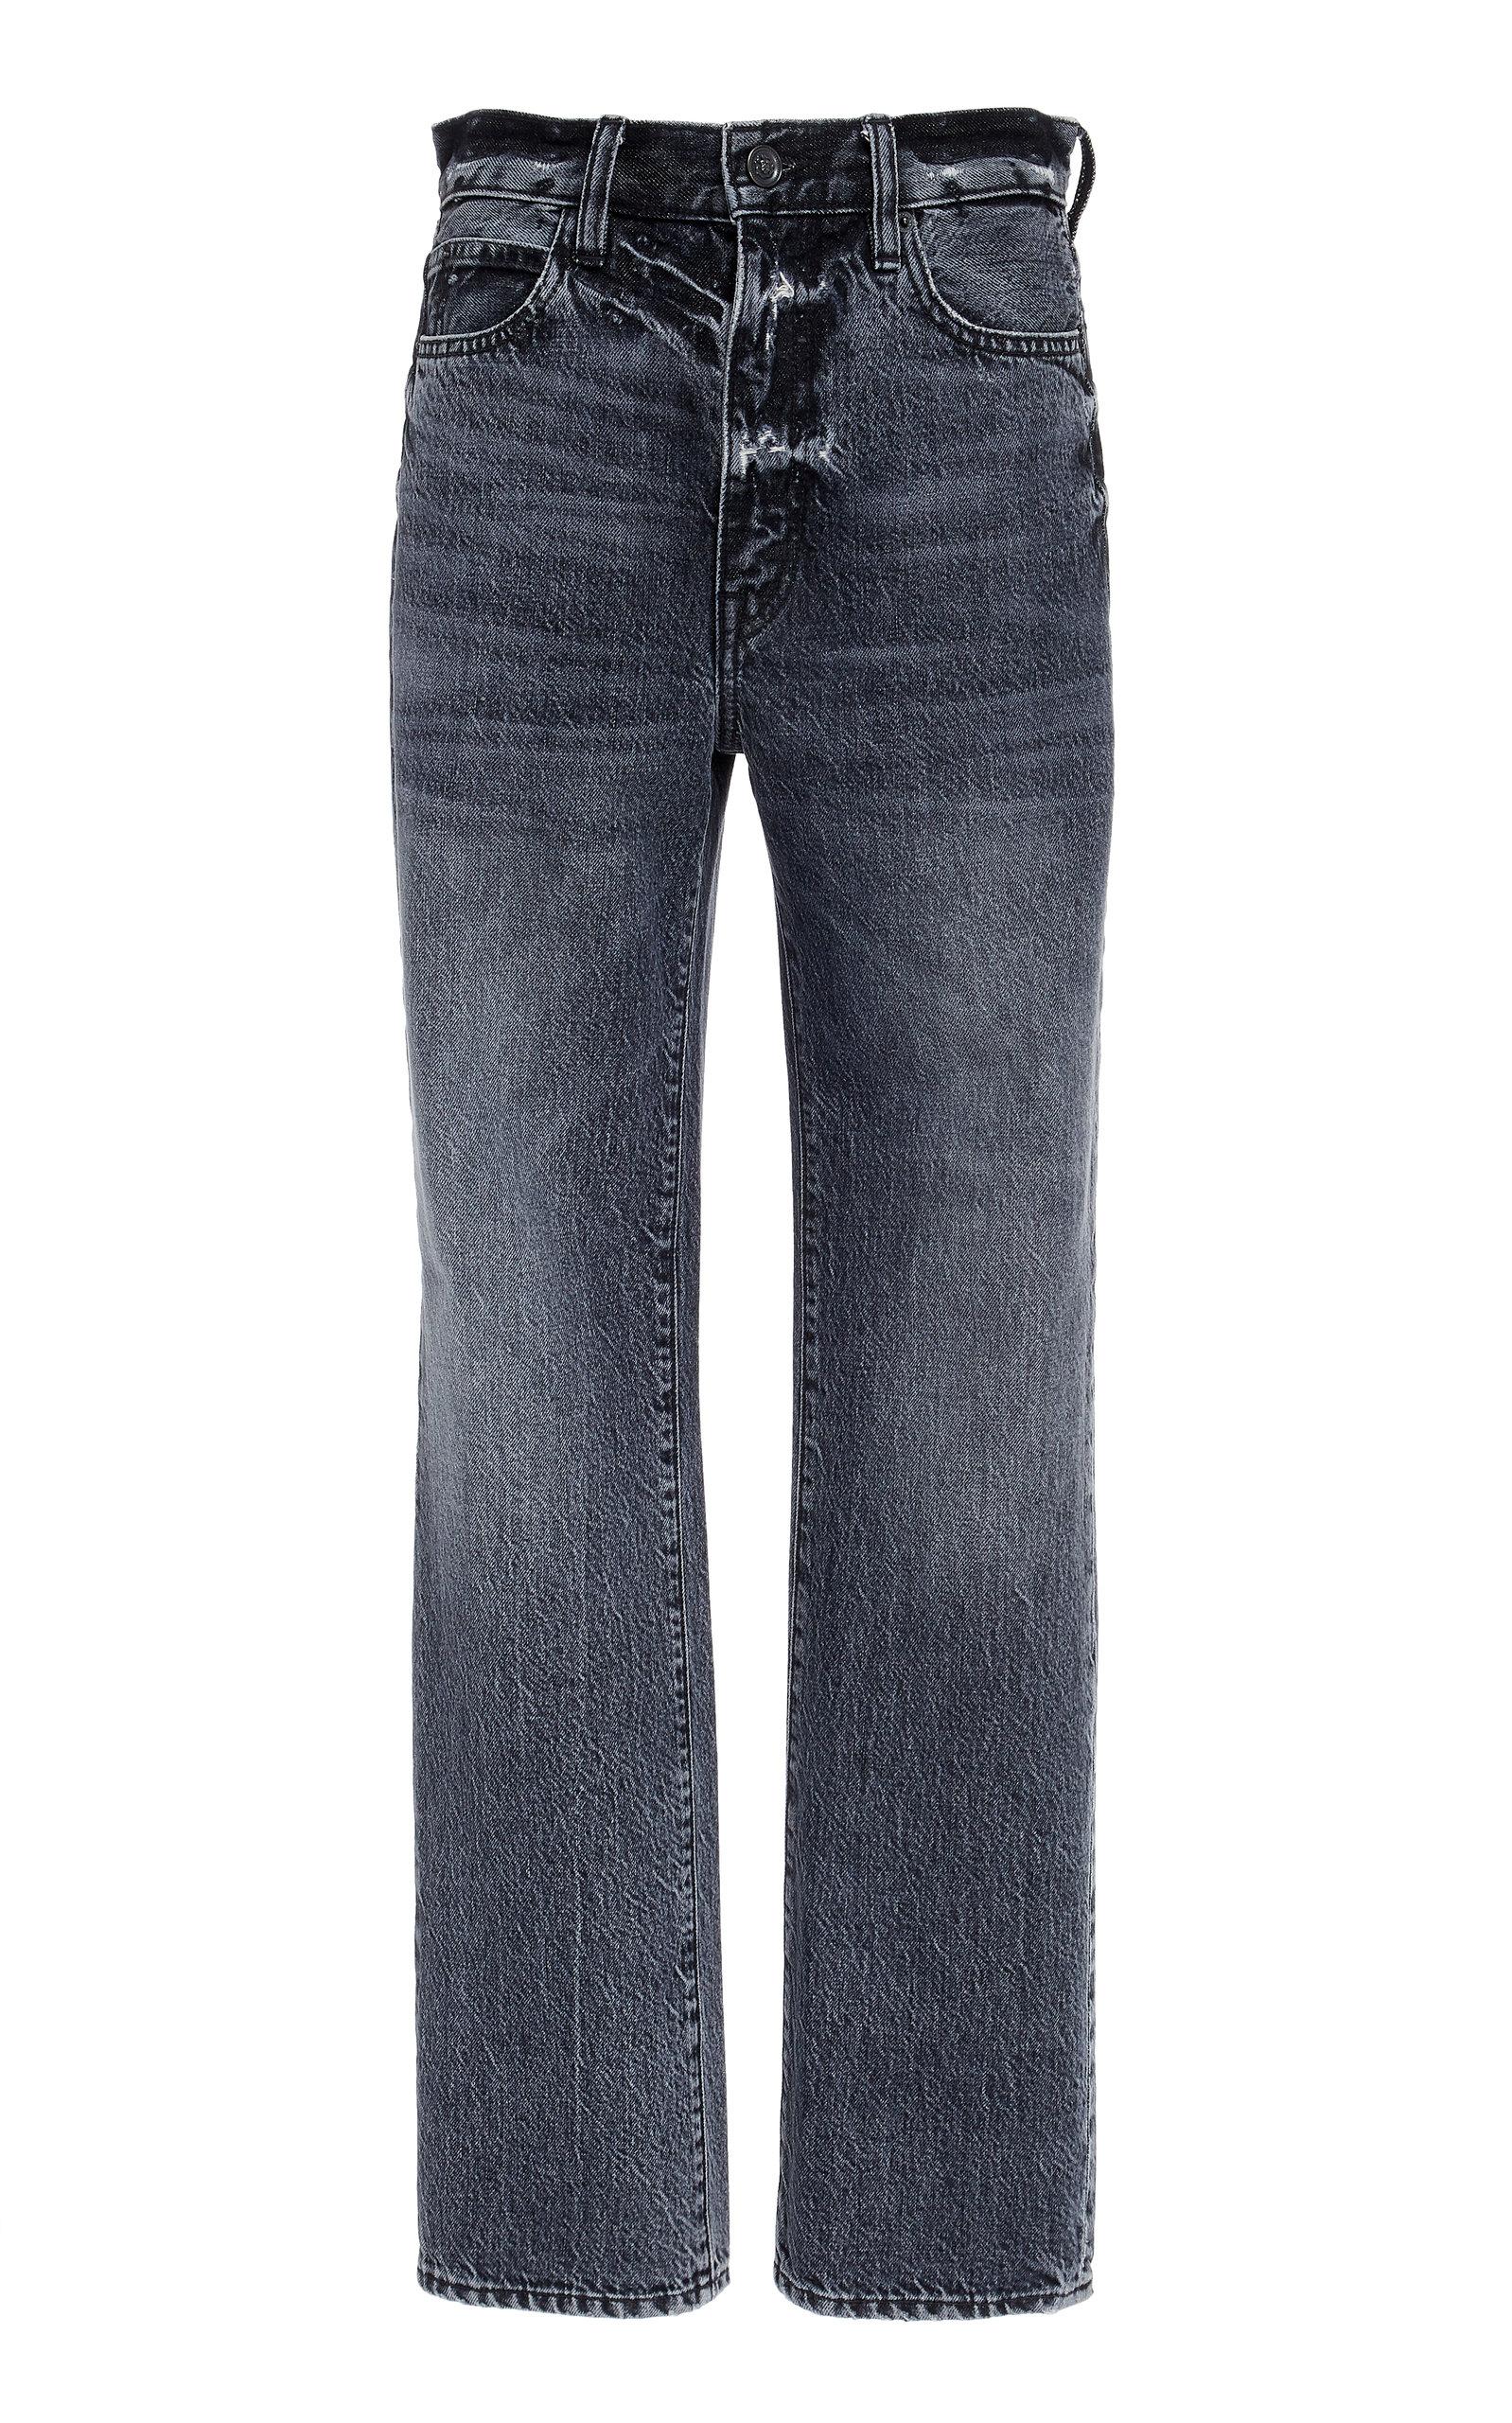 SLVRLAKE DENIM London High-Rise Straight-Leg Jeans in Black